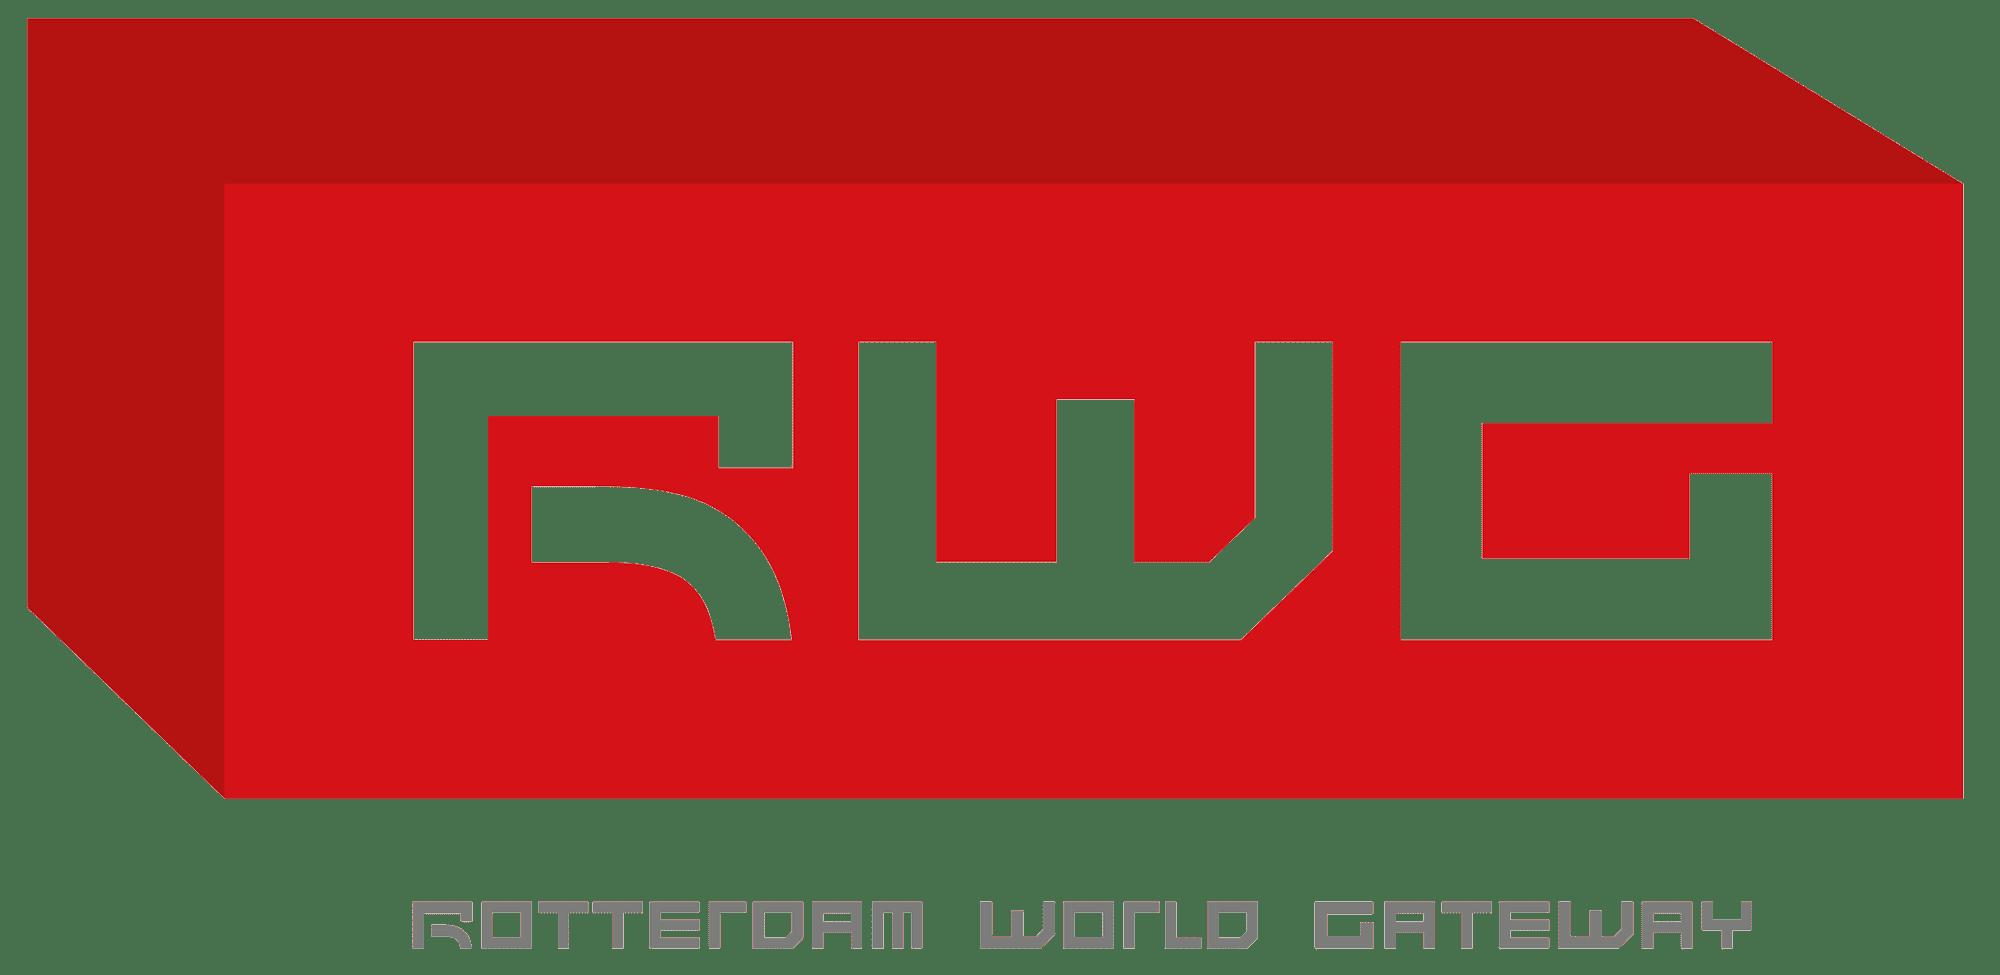 RWG Rotterdam World Gateway